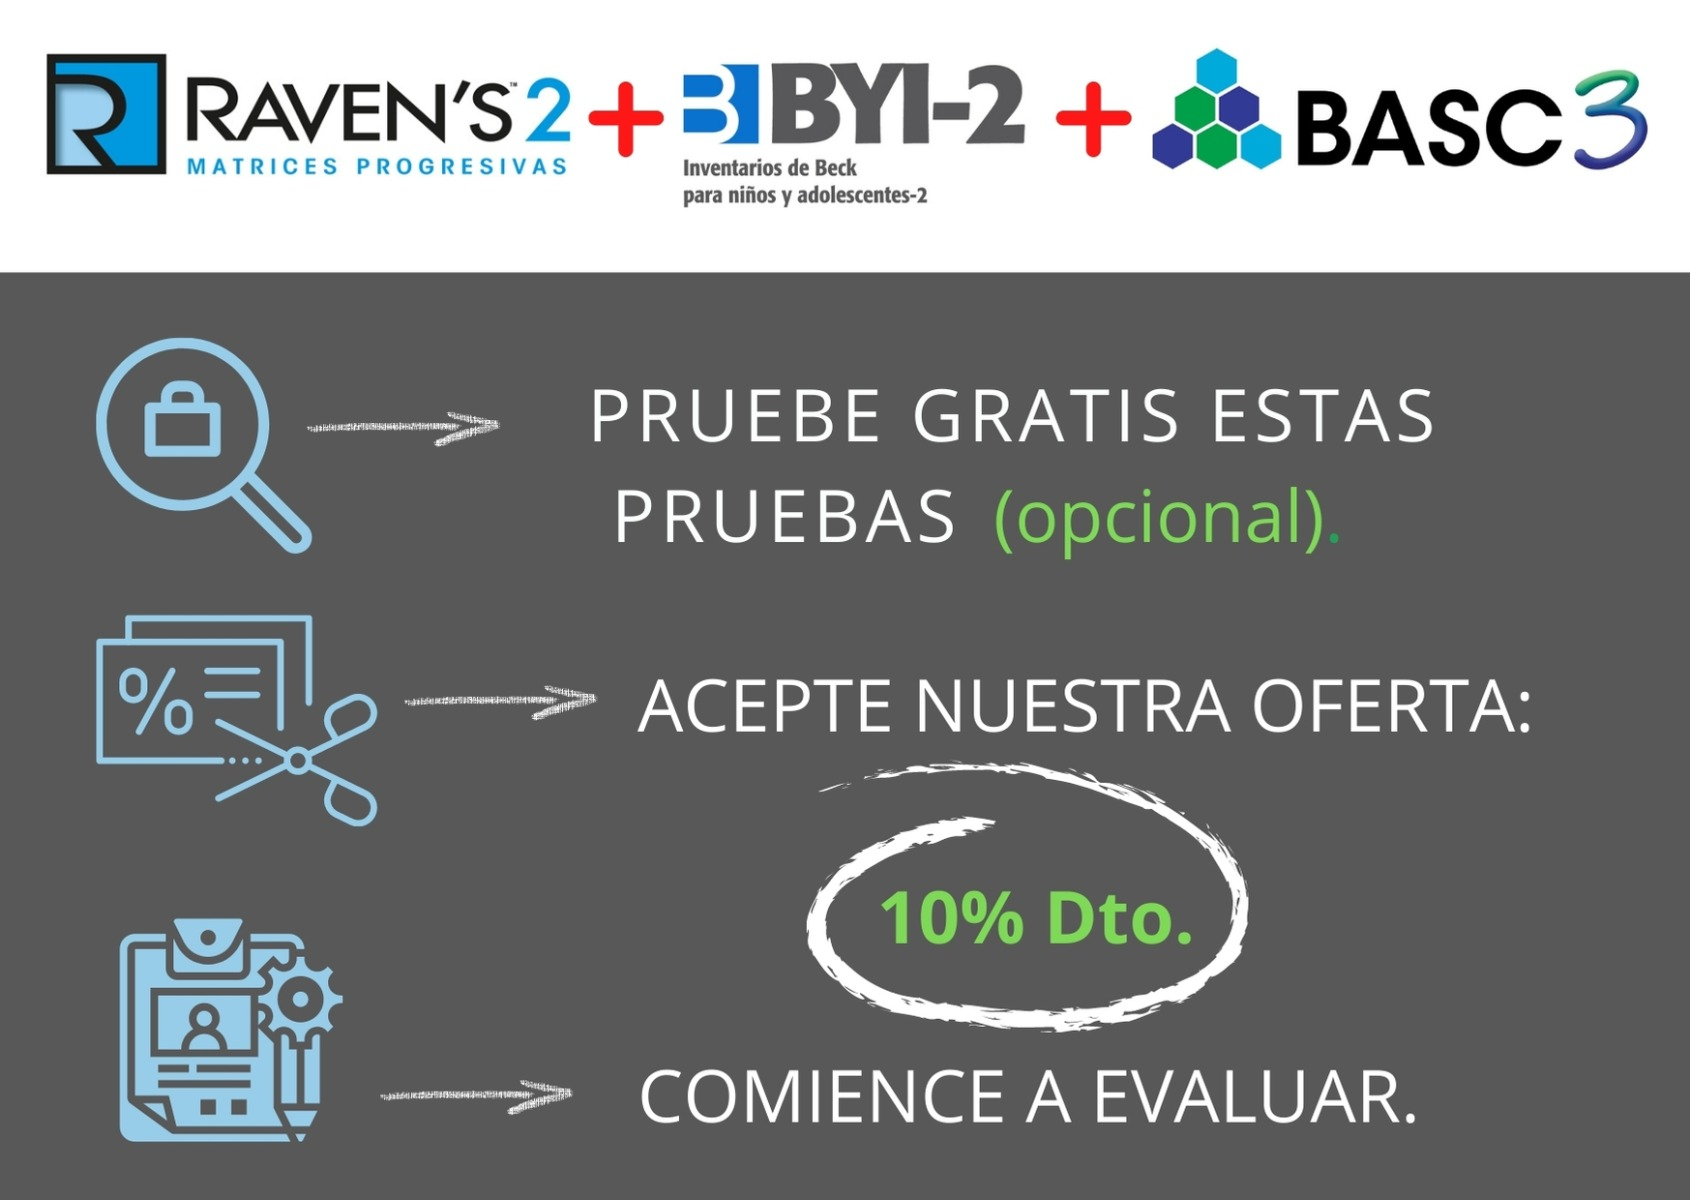 Oferta_BASC3_RAVEN_s_2_y_BYI2